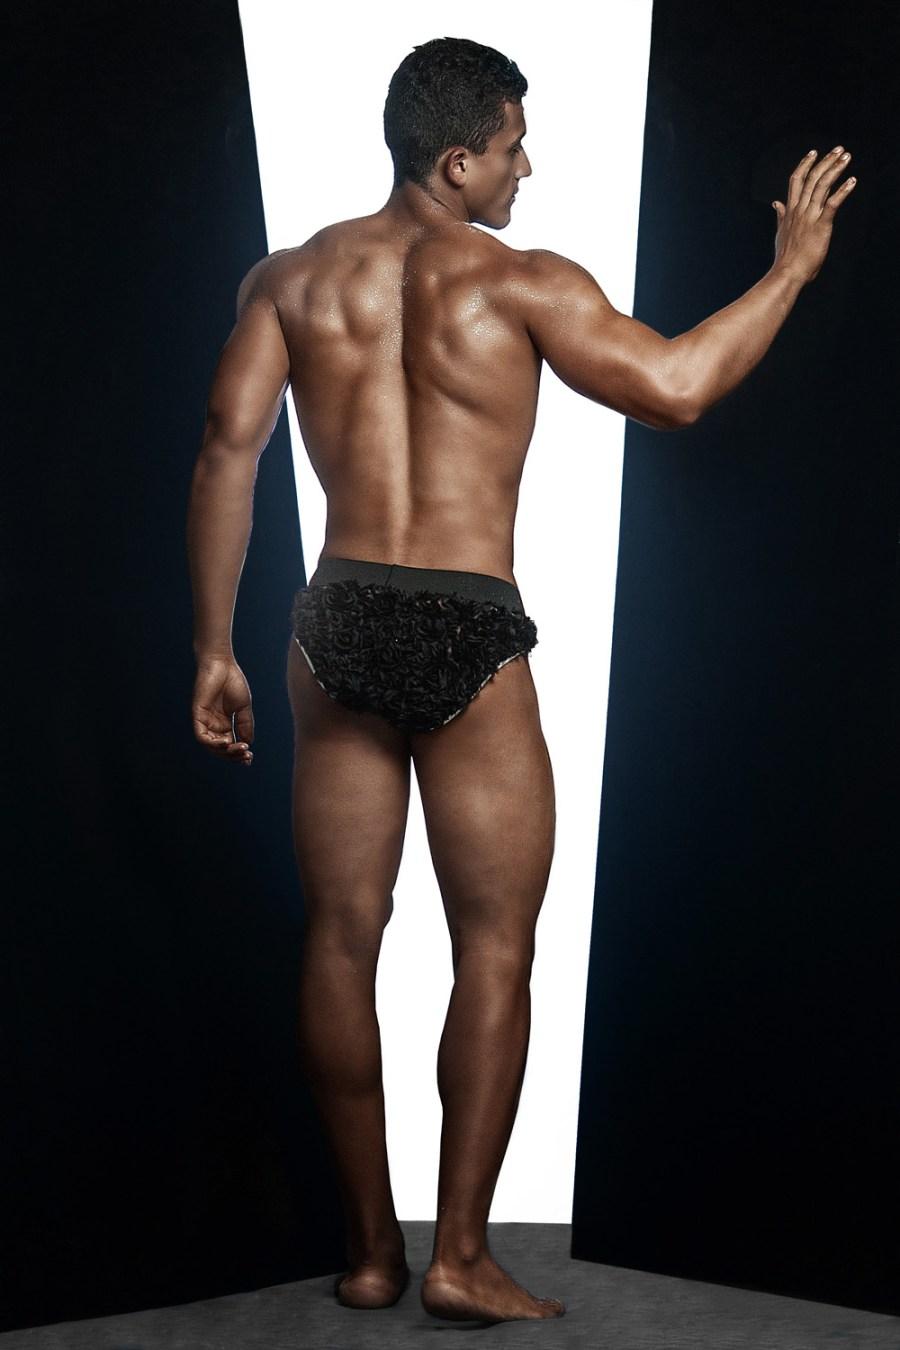 Erik Ramos by Chris Femat for Fashionably Male421